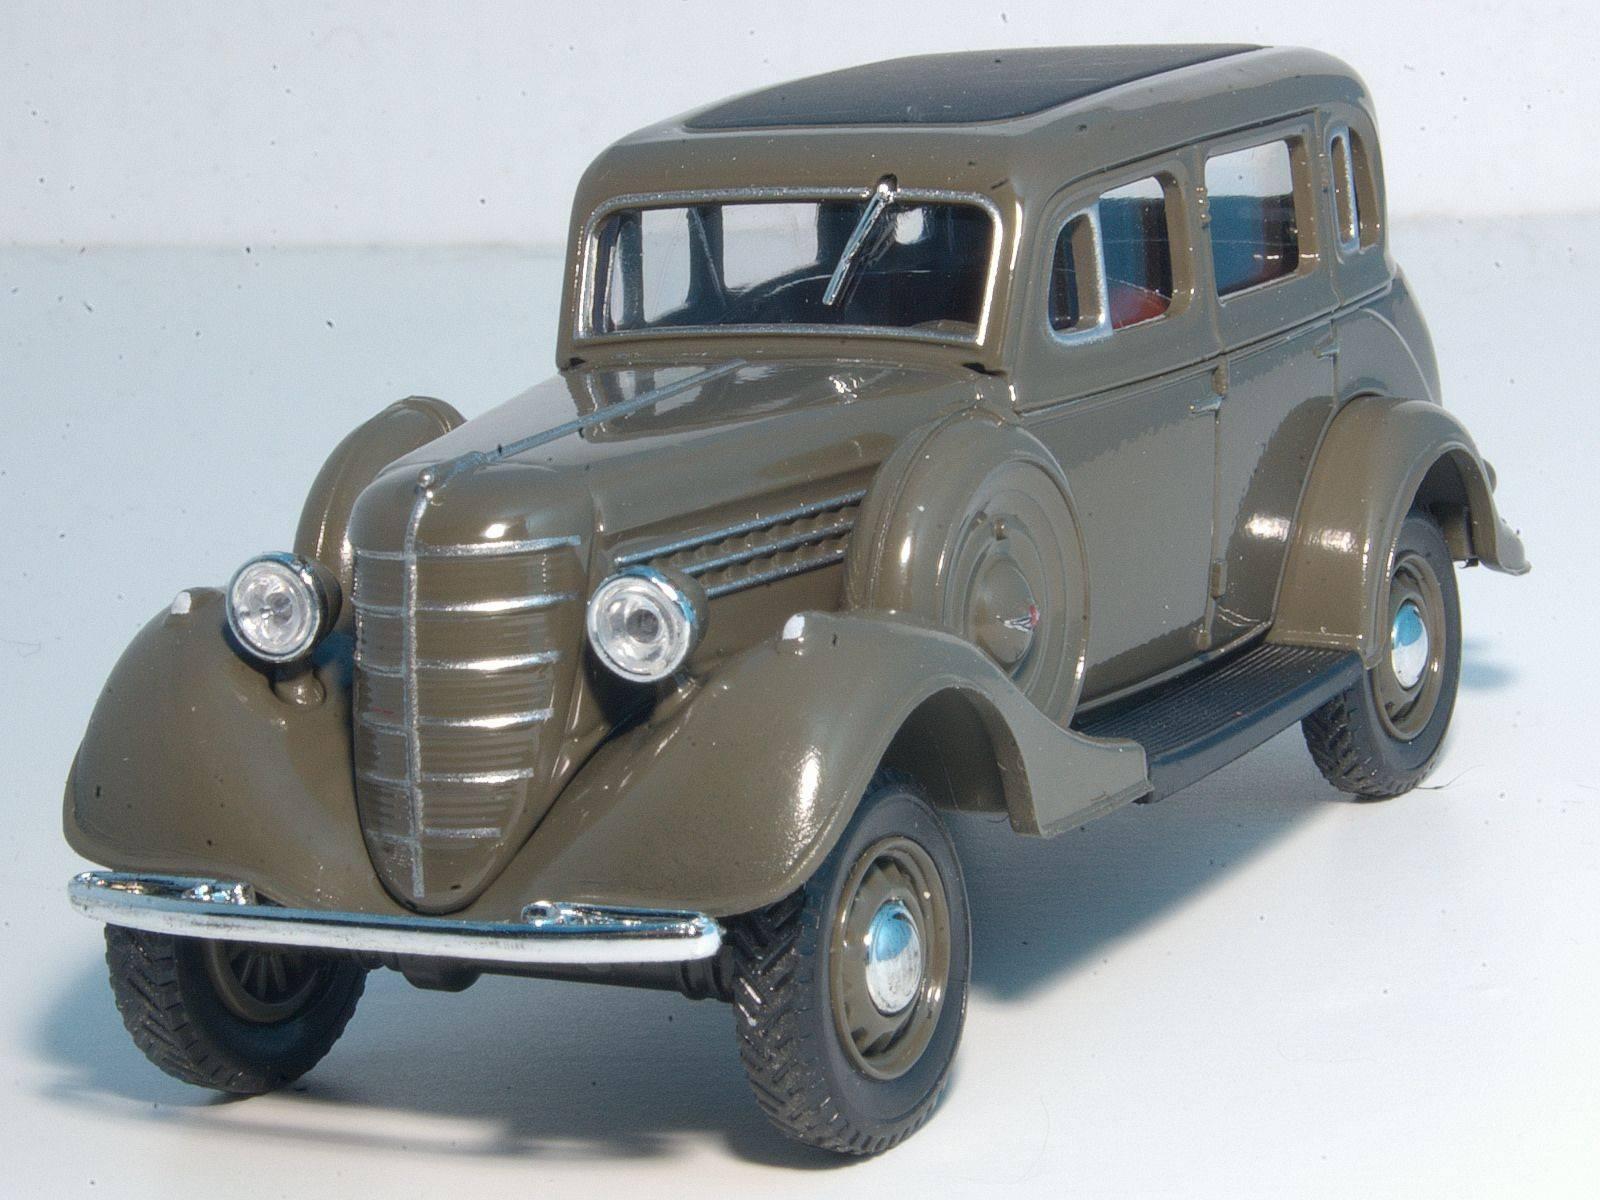 Автомобиль ГАЗ-61 - Stone Forest